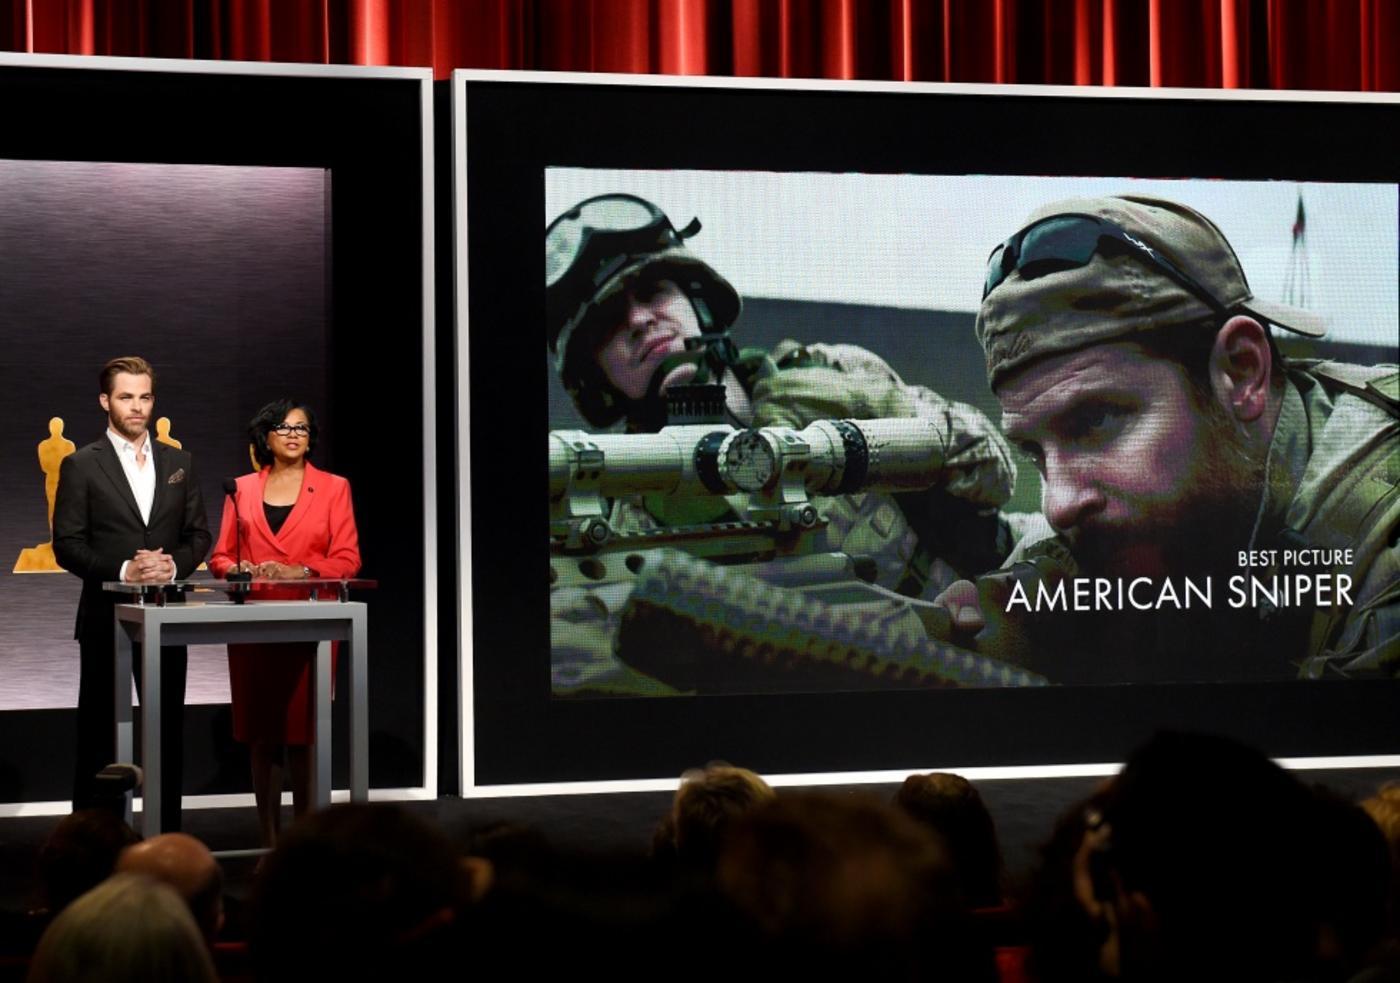 American Sniper mirrors the war on terror propaganda